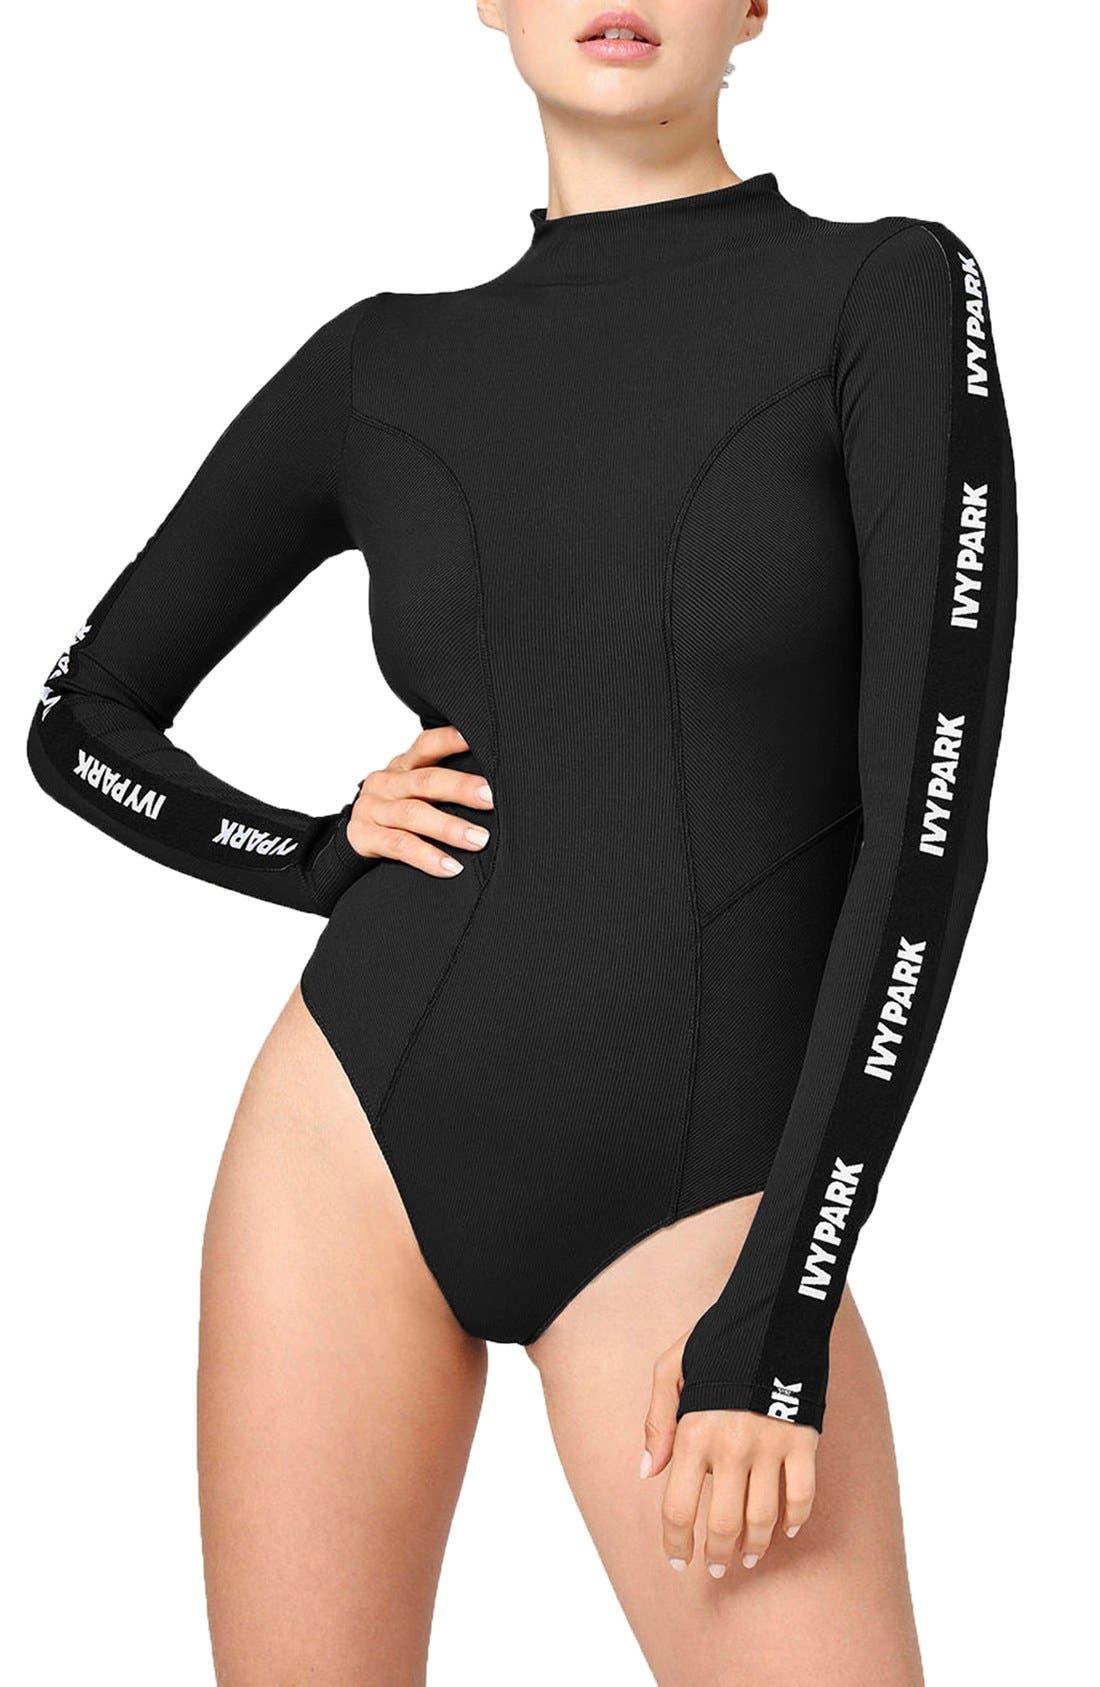 Alternate Image 1 Selected - IVY PARK® Elastic Logo Sleeve Bodysuit